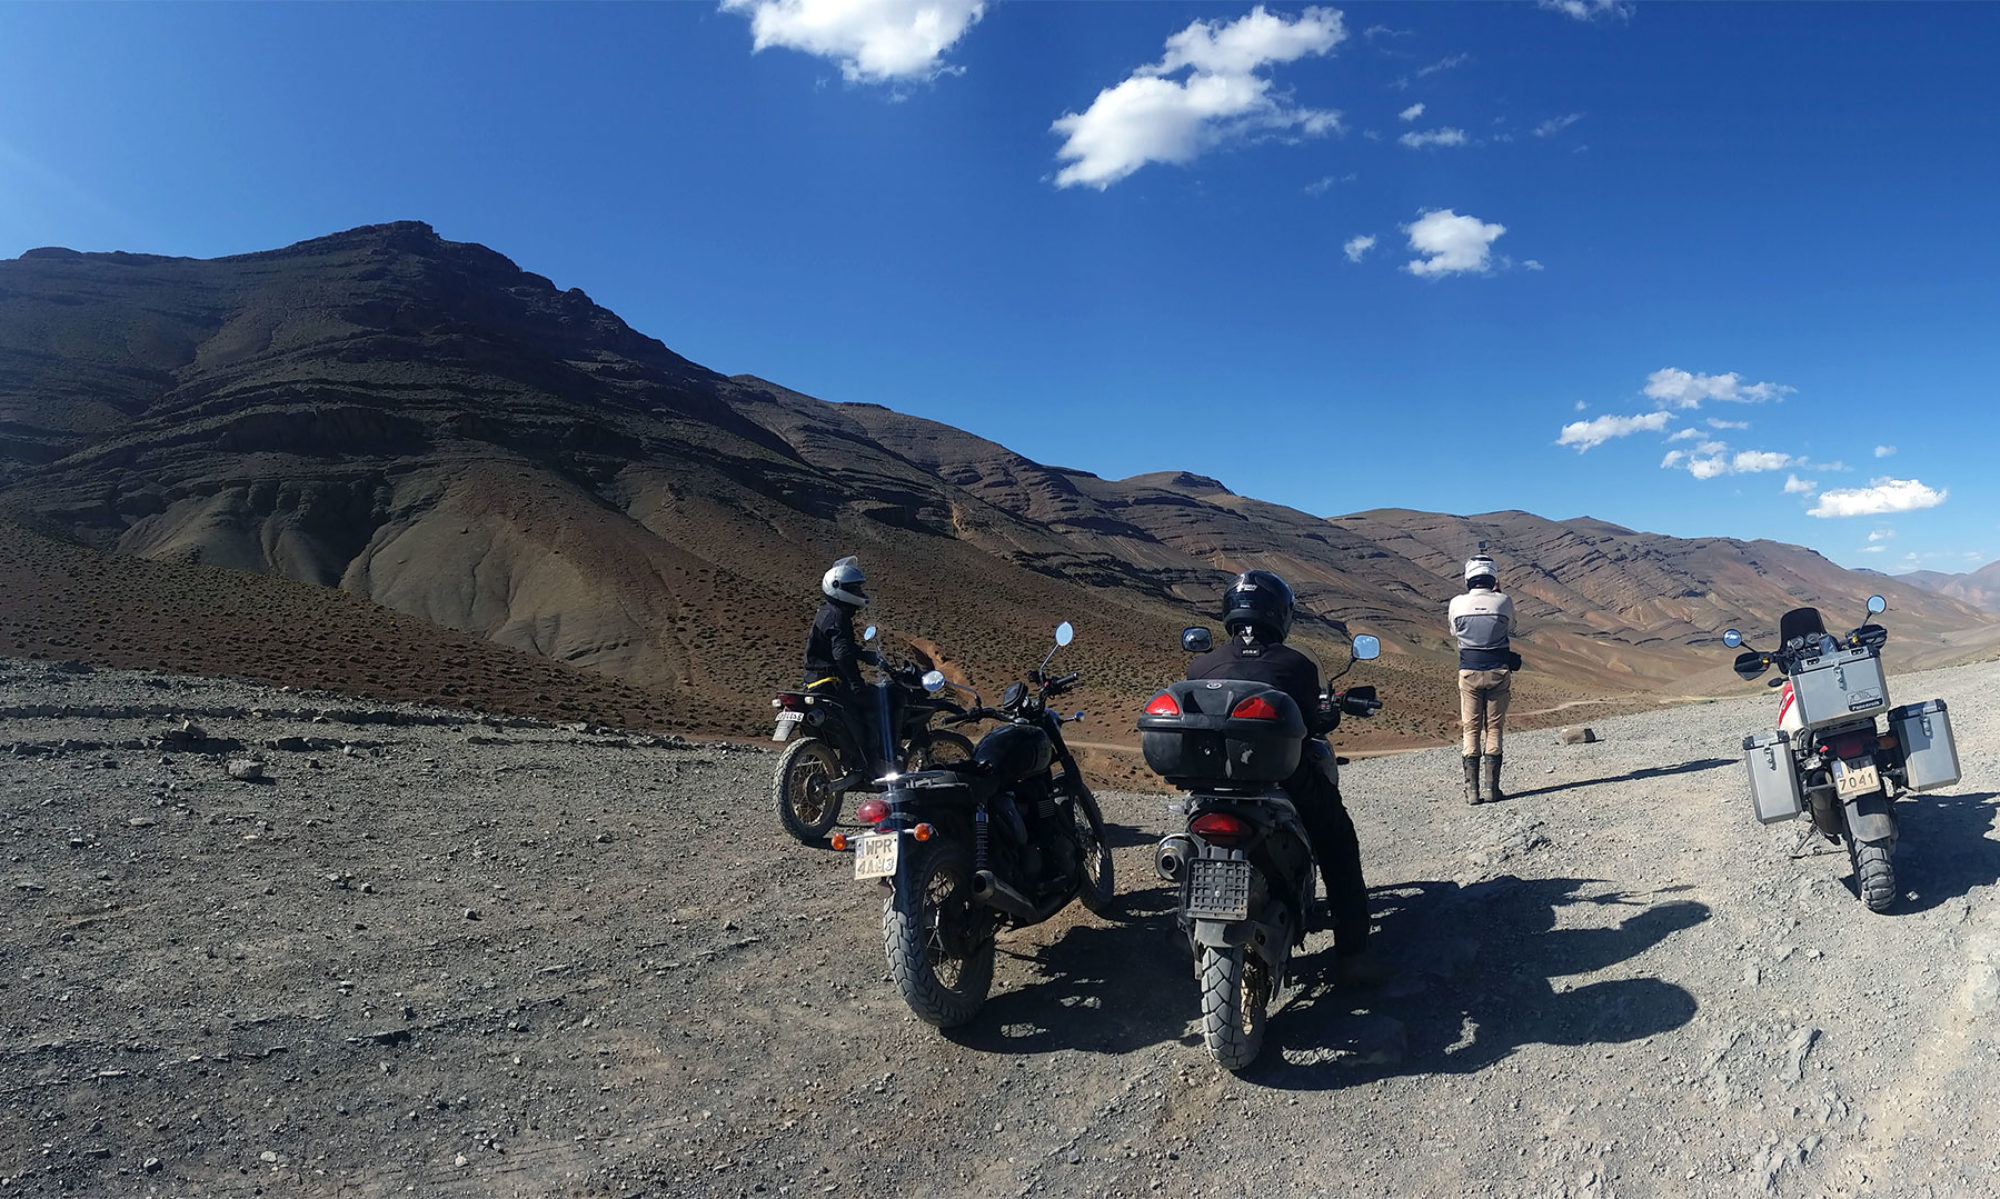 Motorcycle Oddity